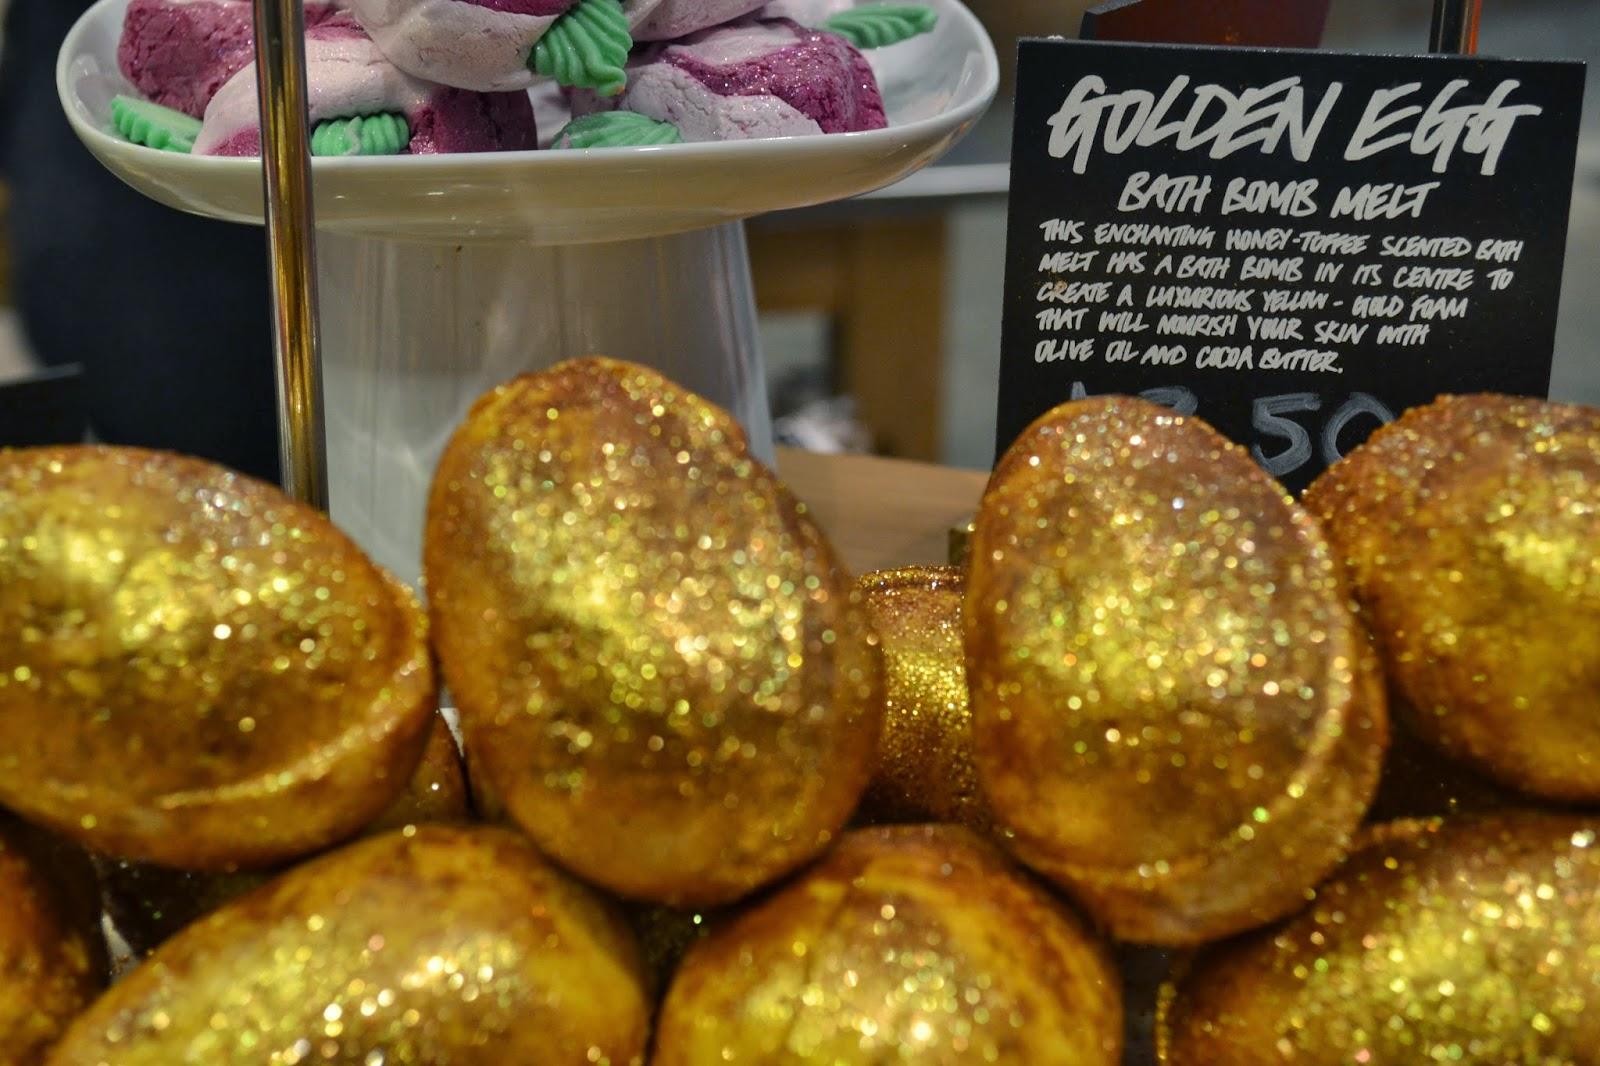 lush-golden-egg-bath-bomb